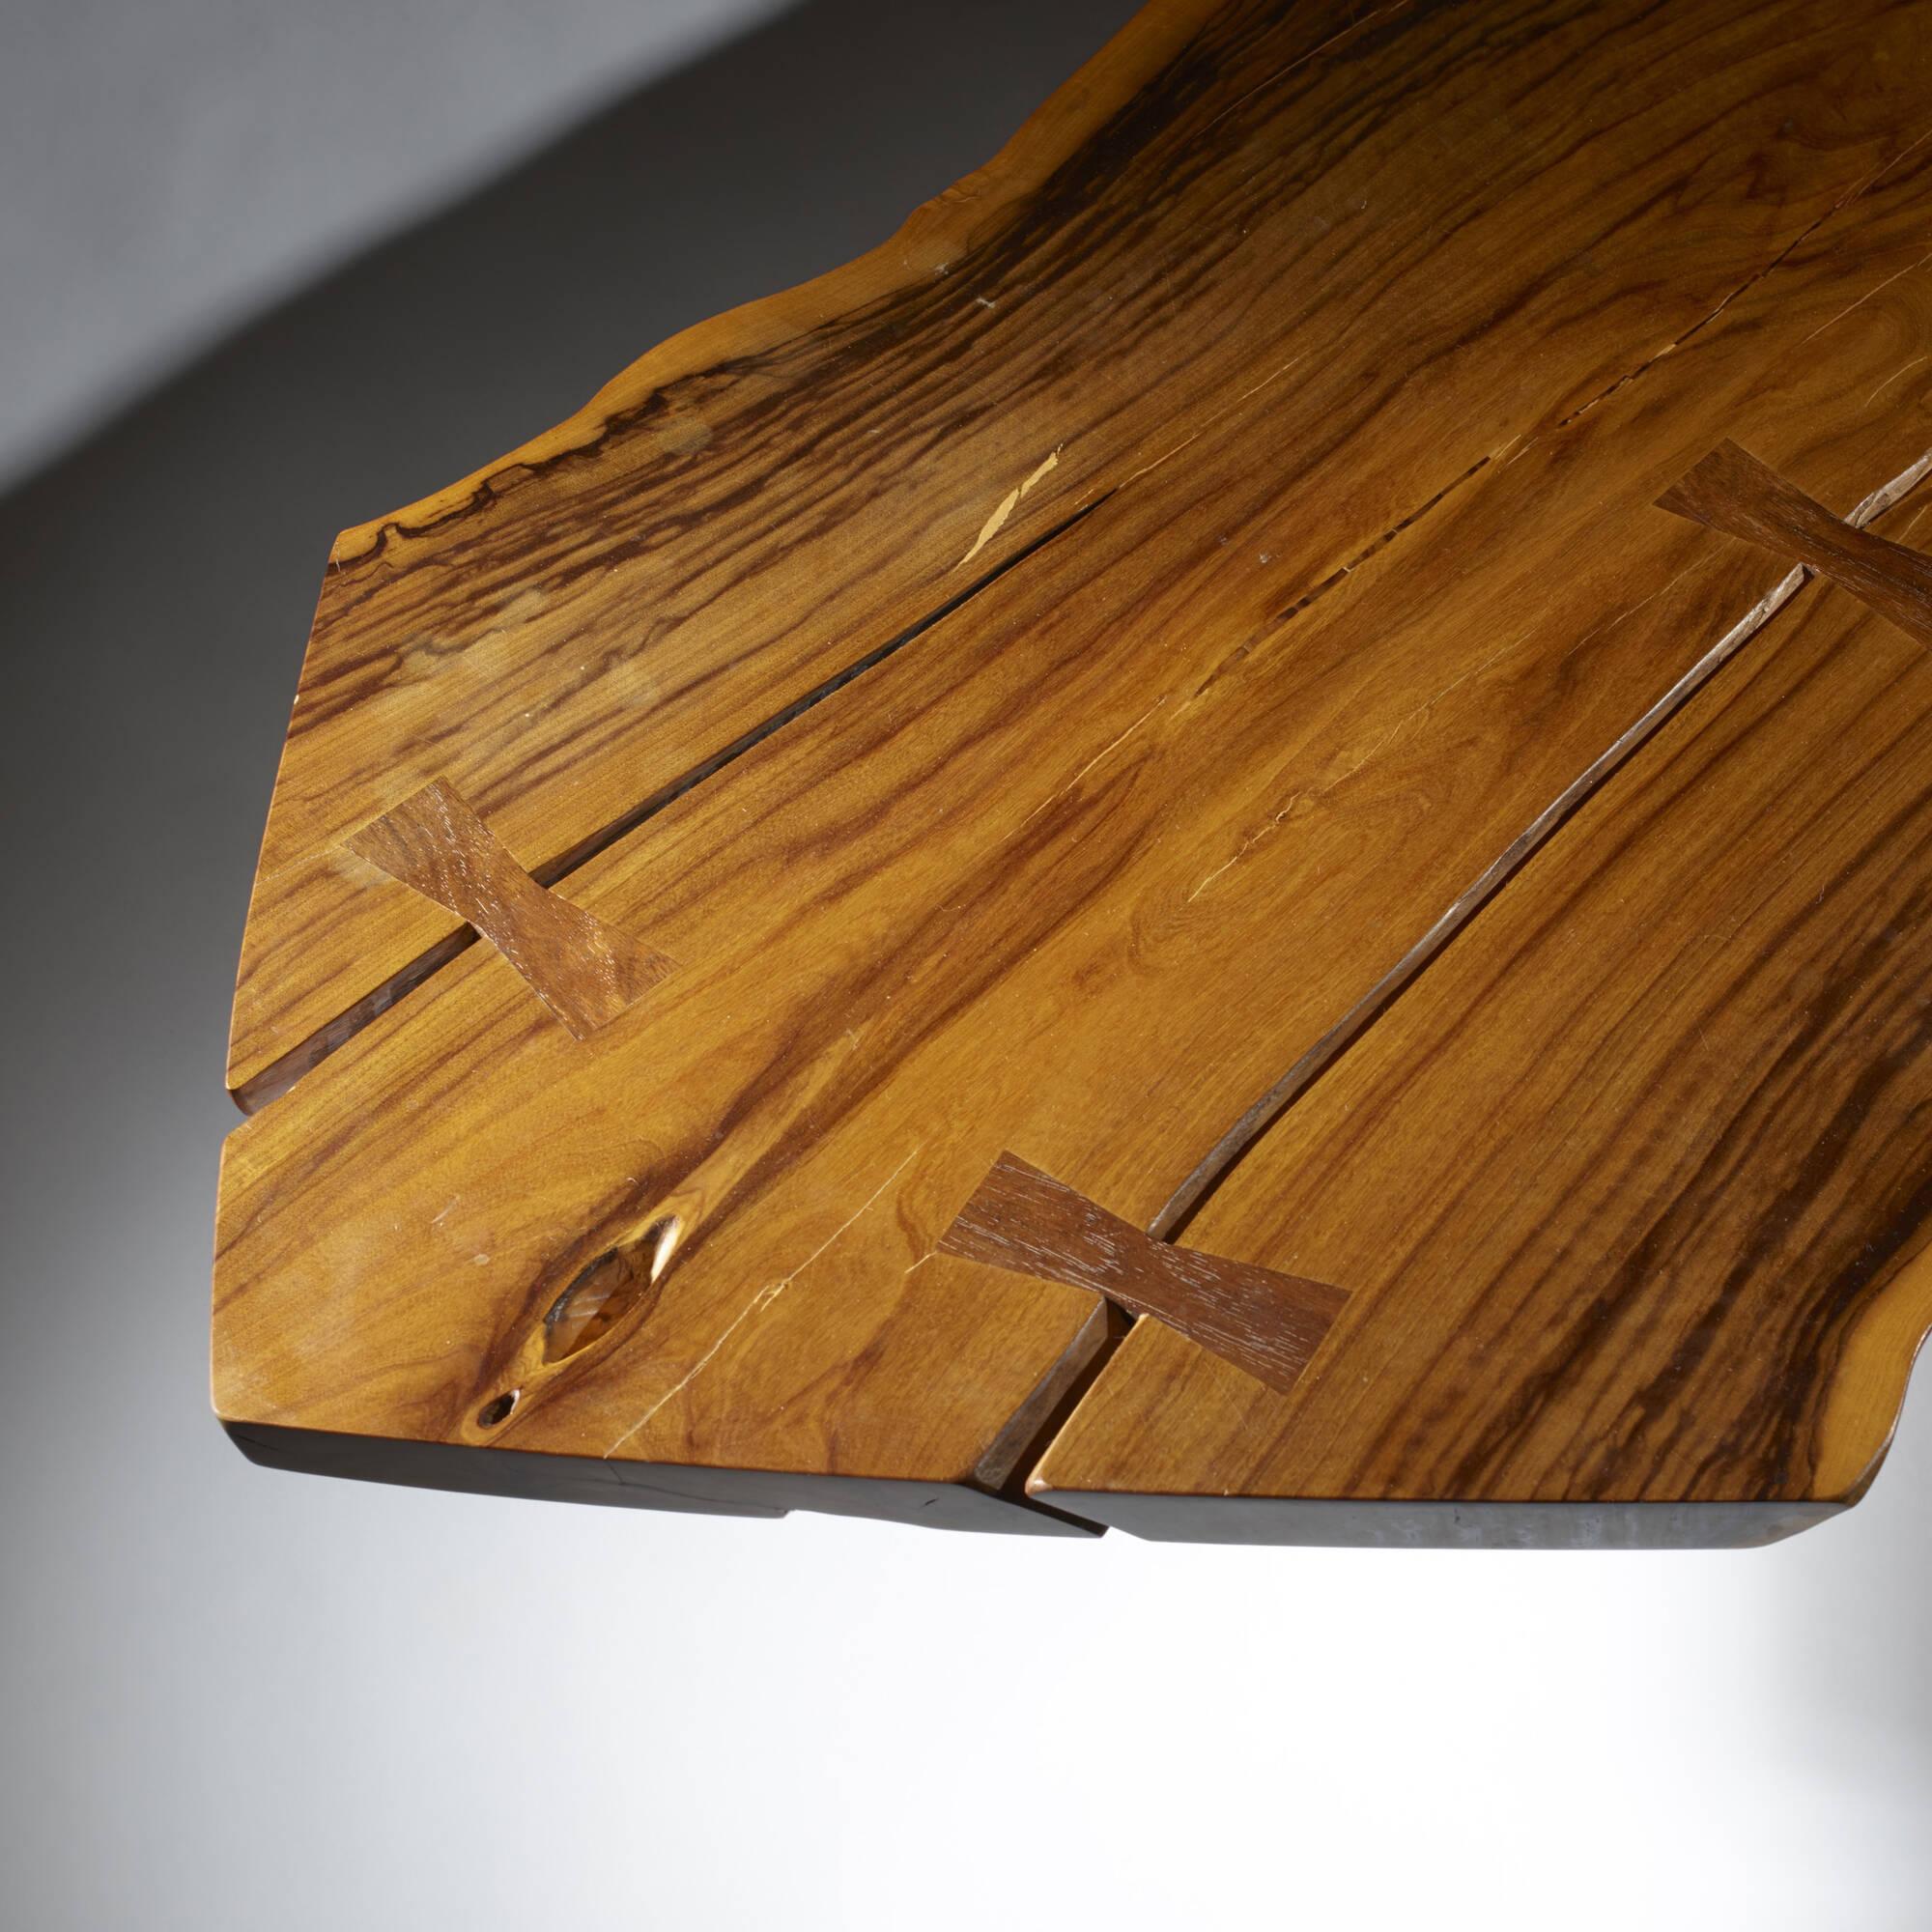 174: Mira Nakashima / coffee table (5 of 5)